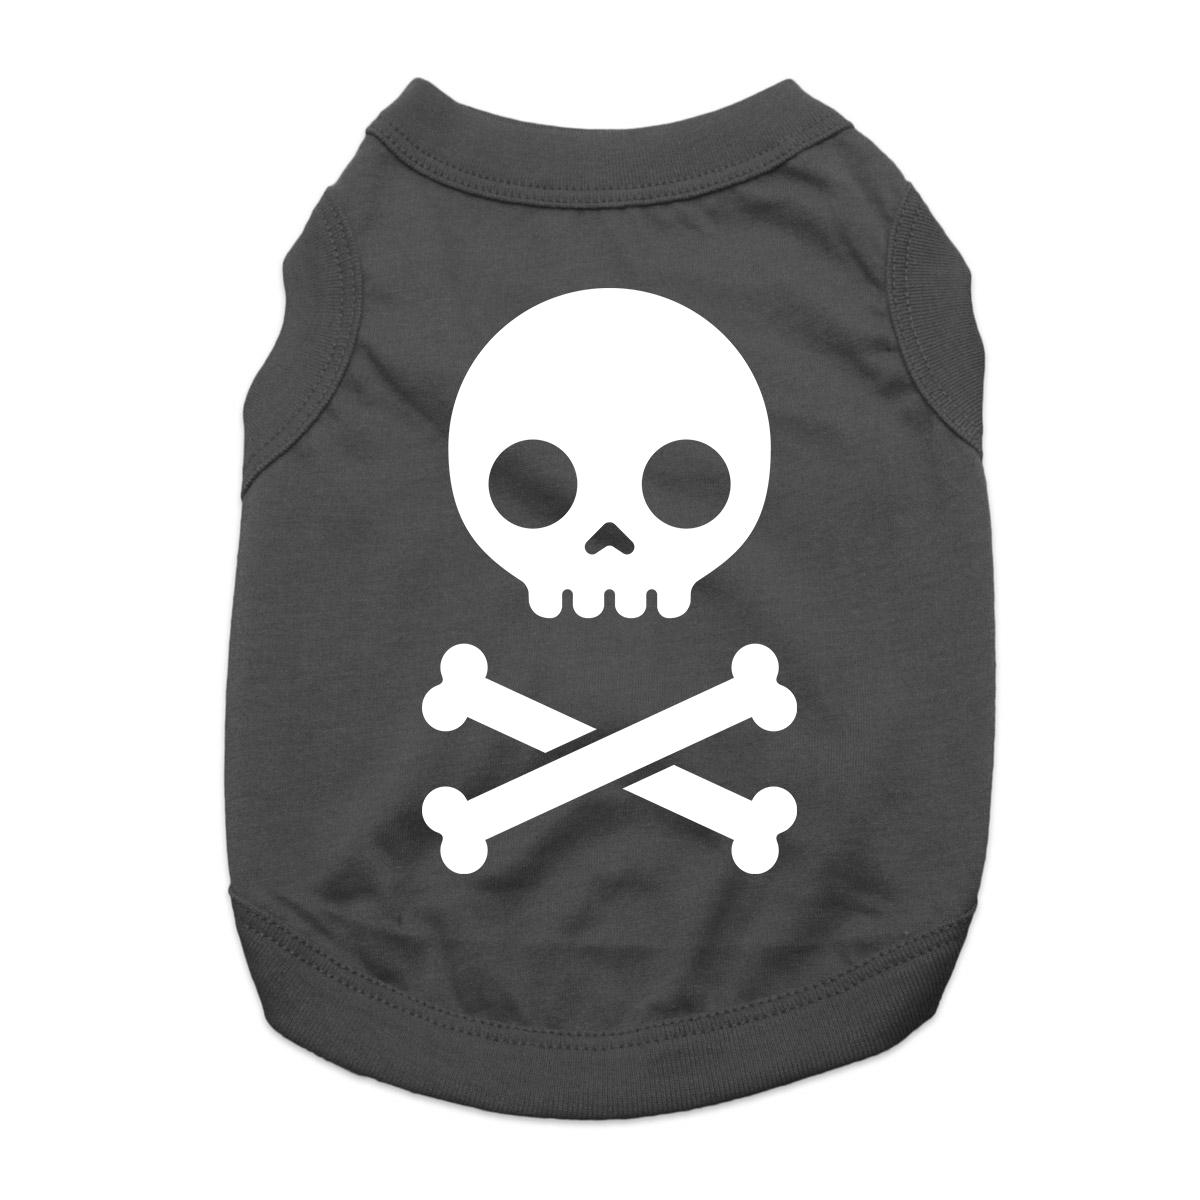 Skull and Bones Dog Shirt - Black